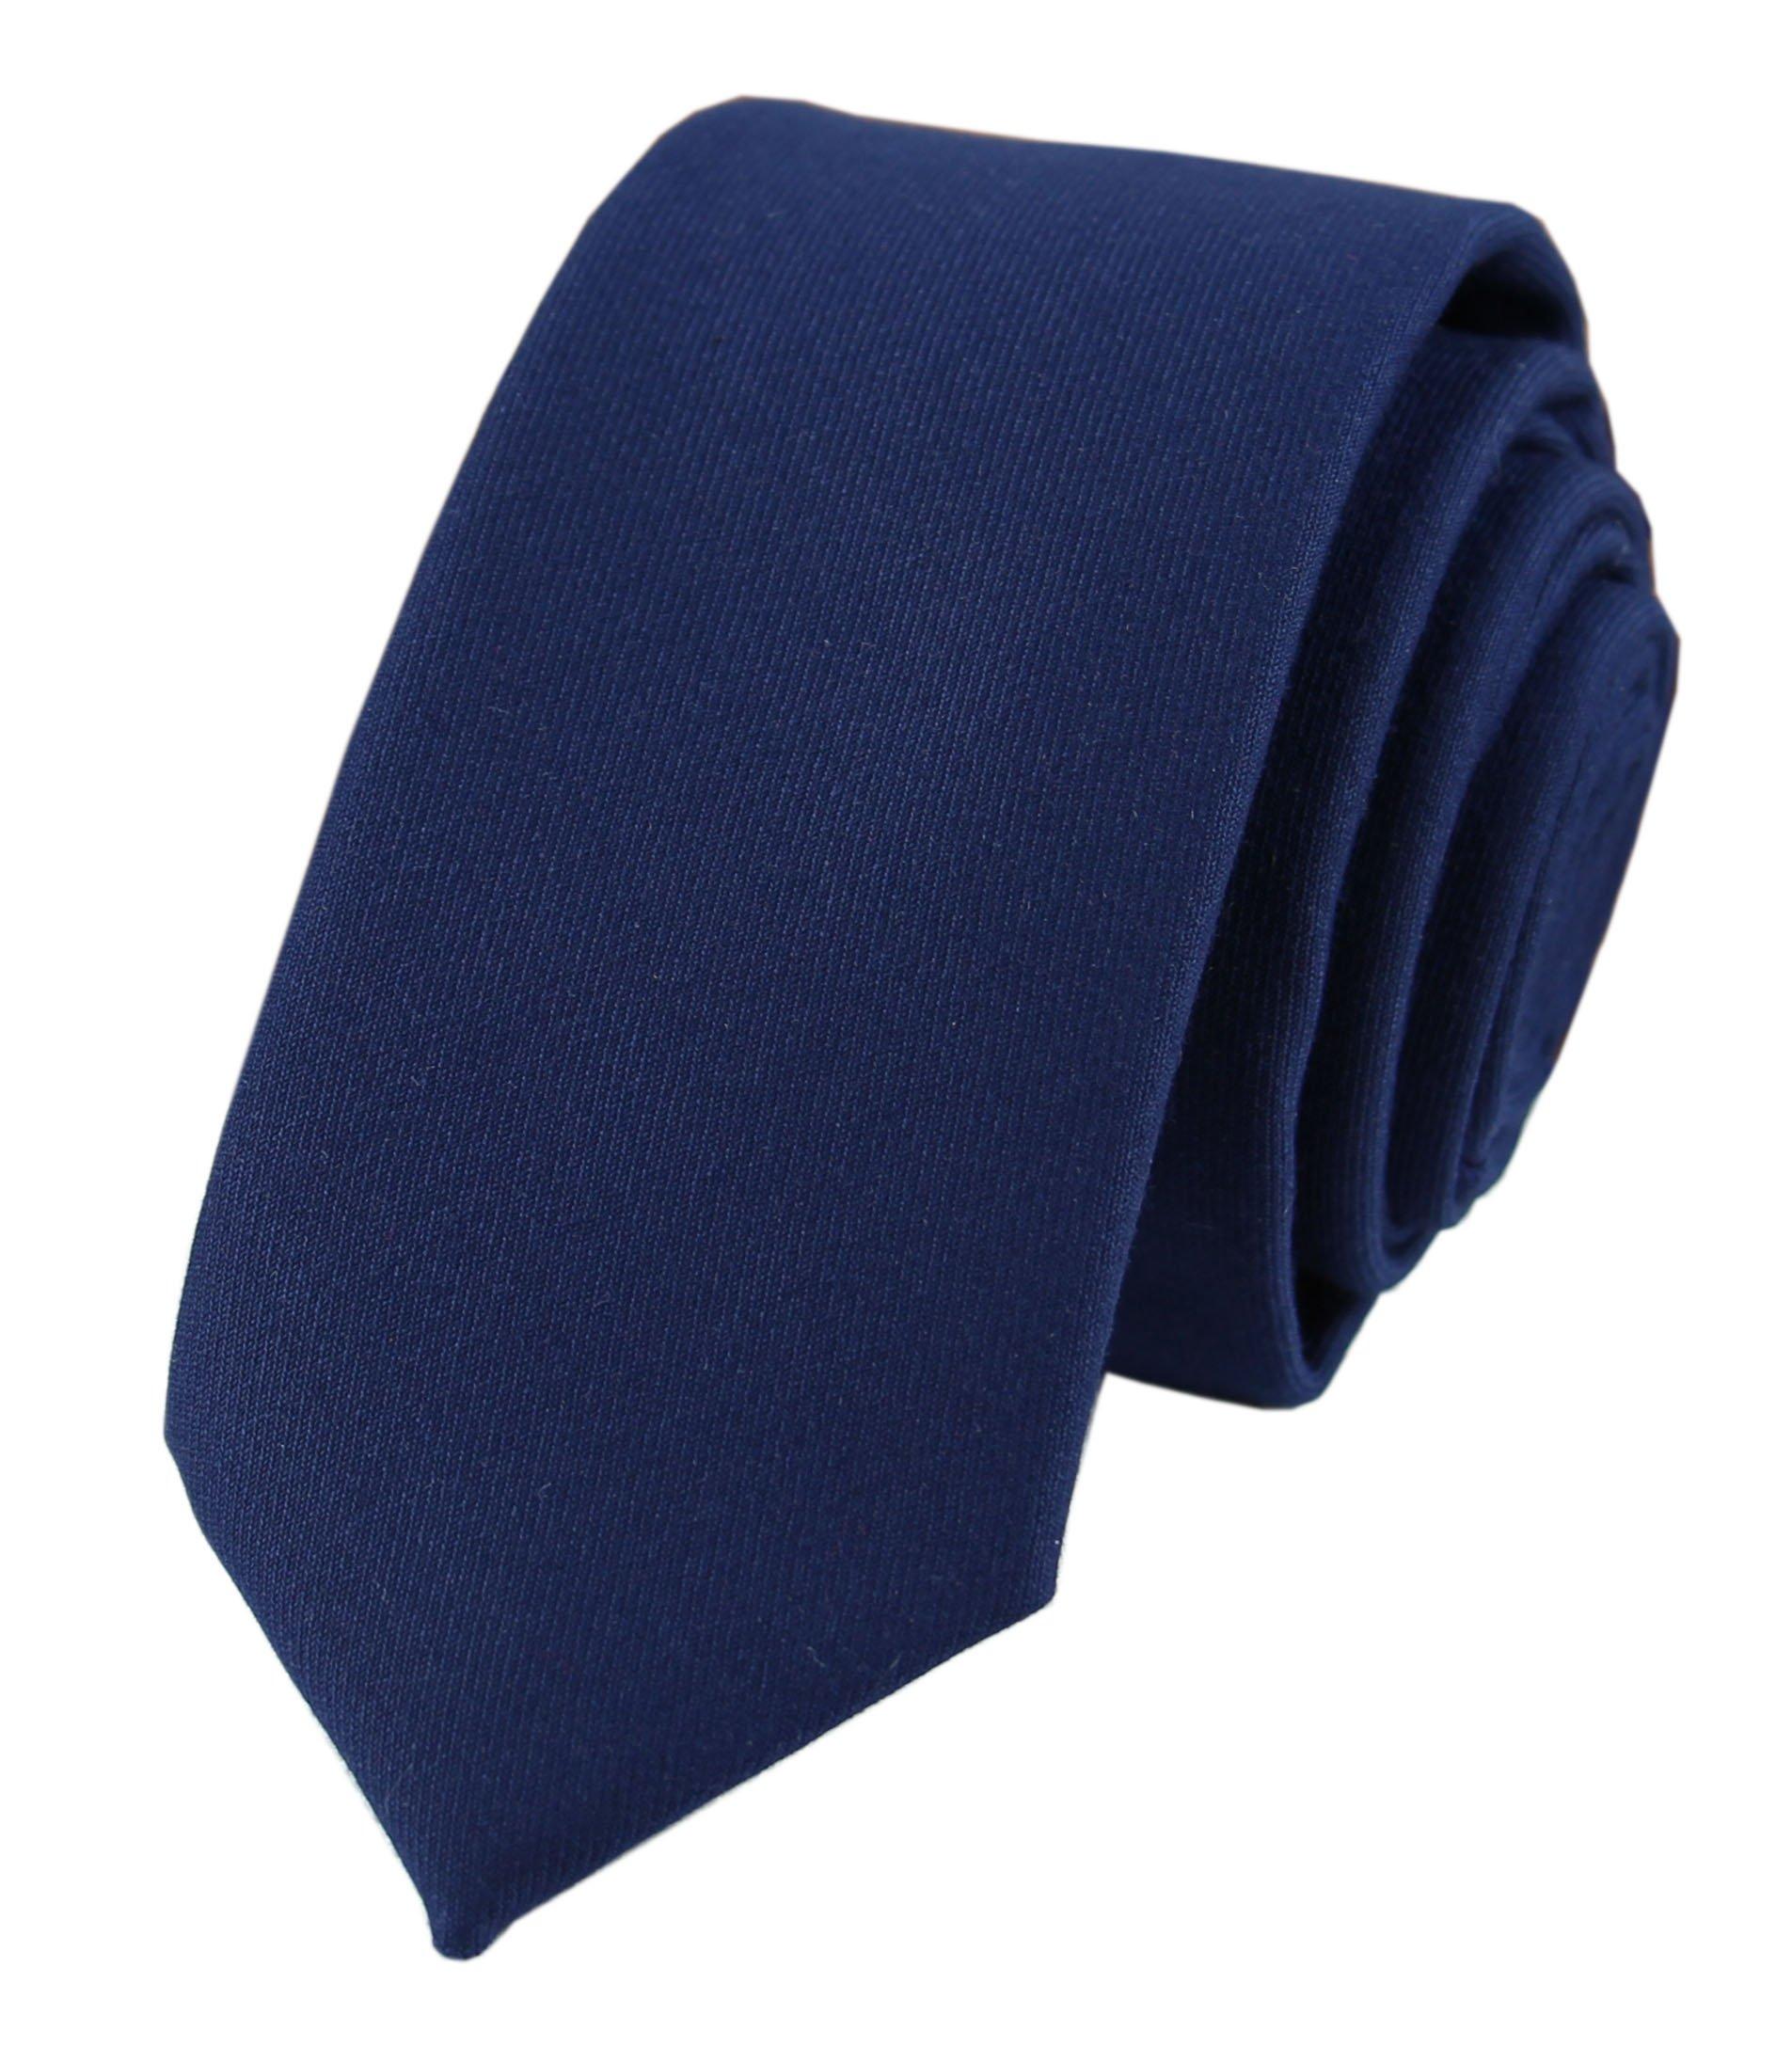 Navy Blue Cotton Tie for Men Big Boy Youth Super Narrow Necktie Skinny Width Cut